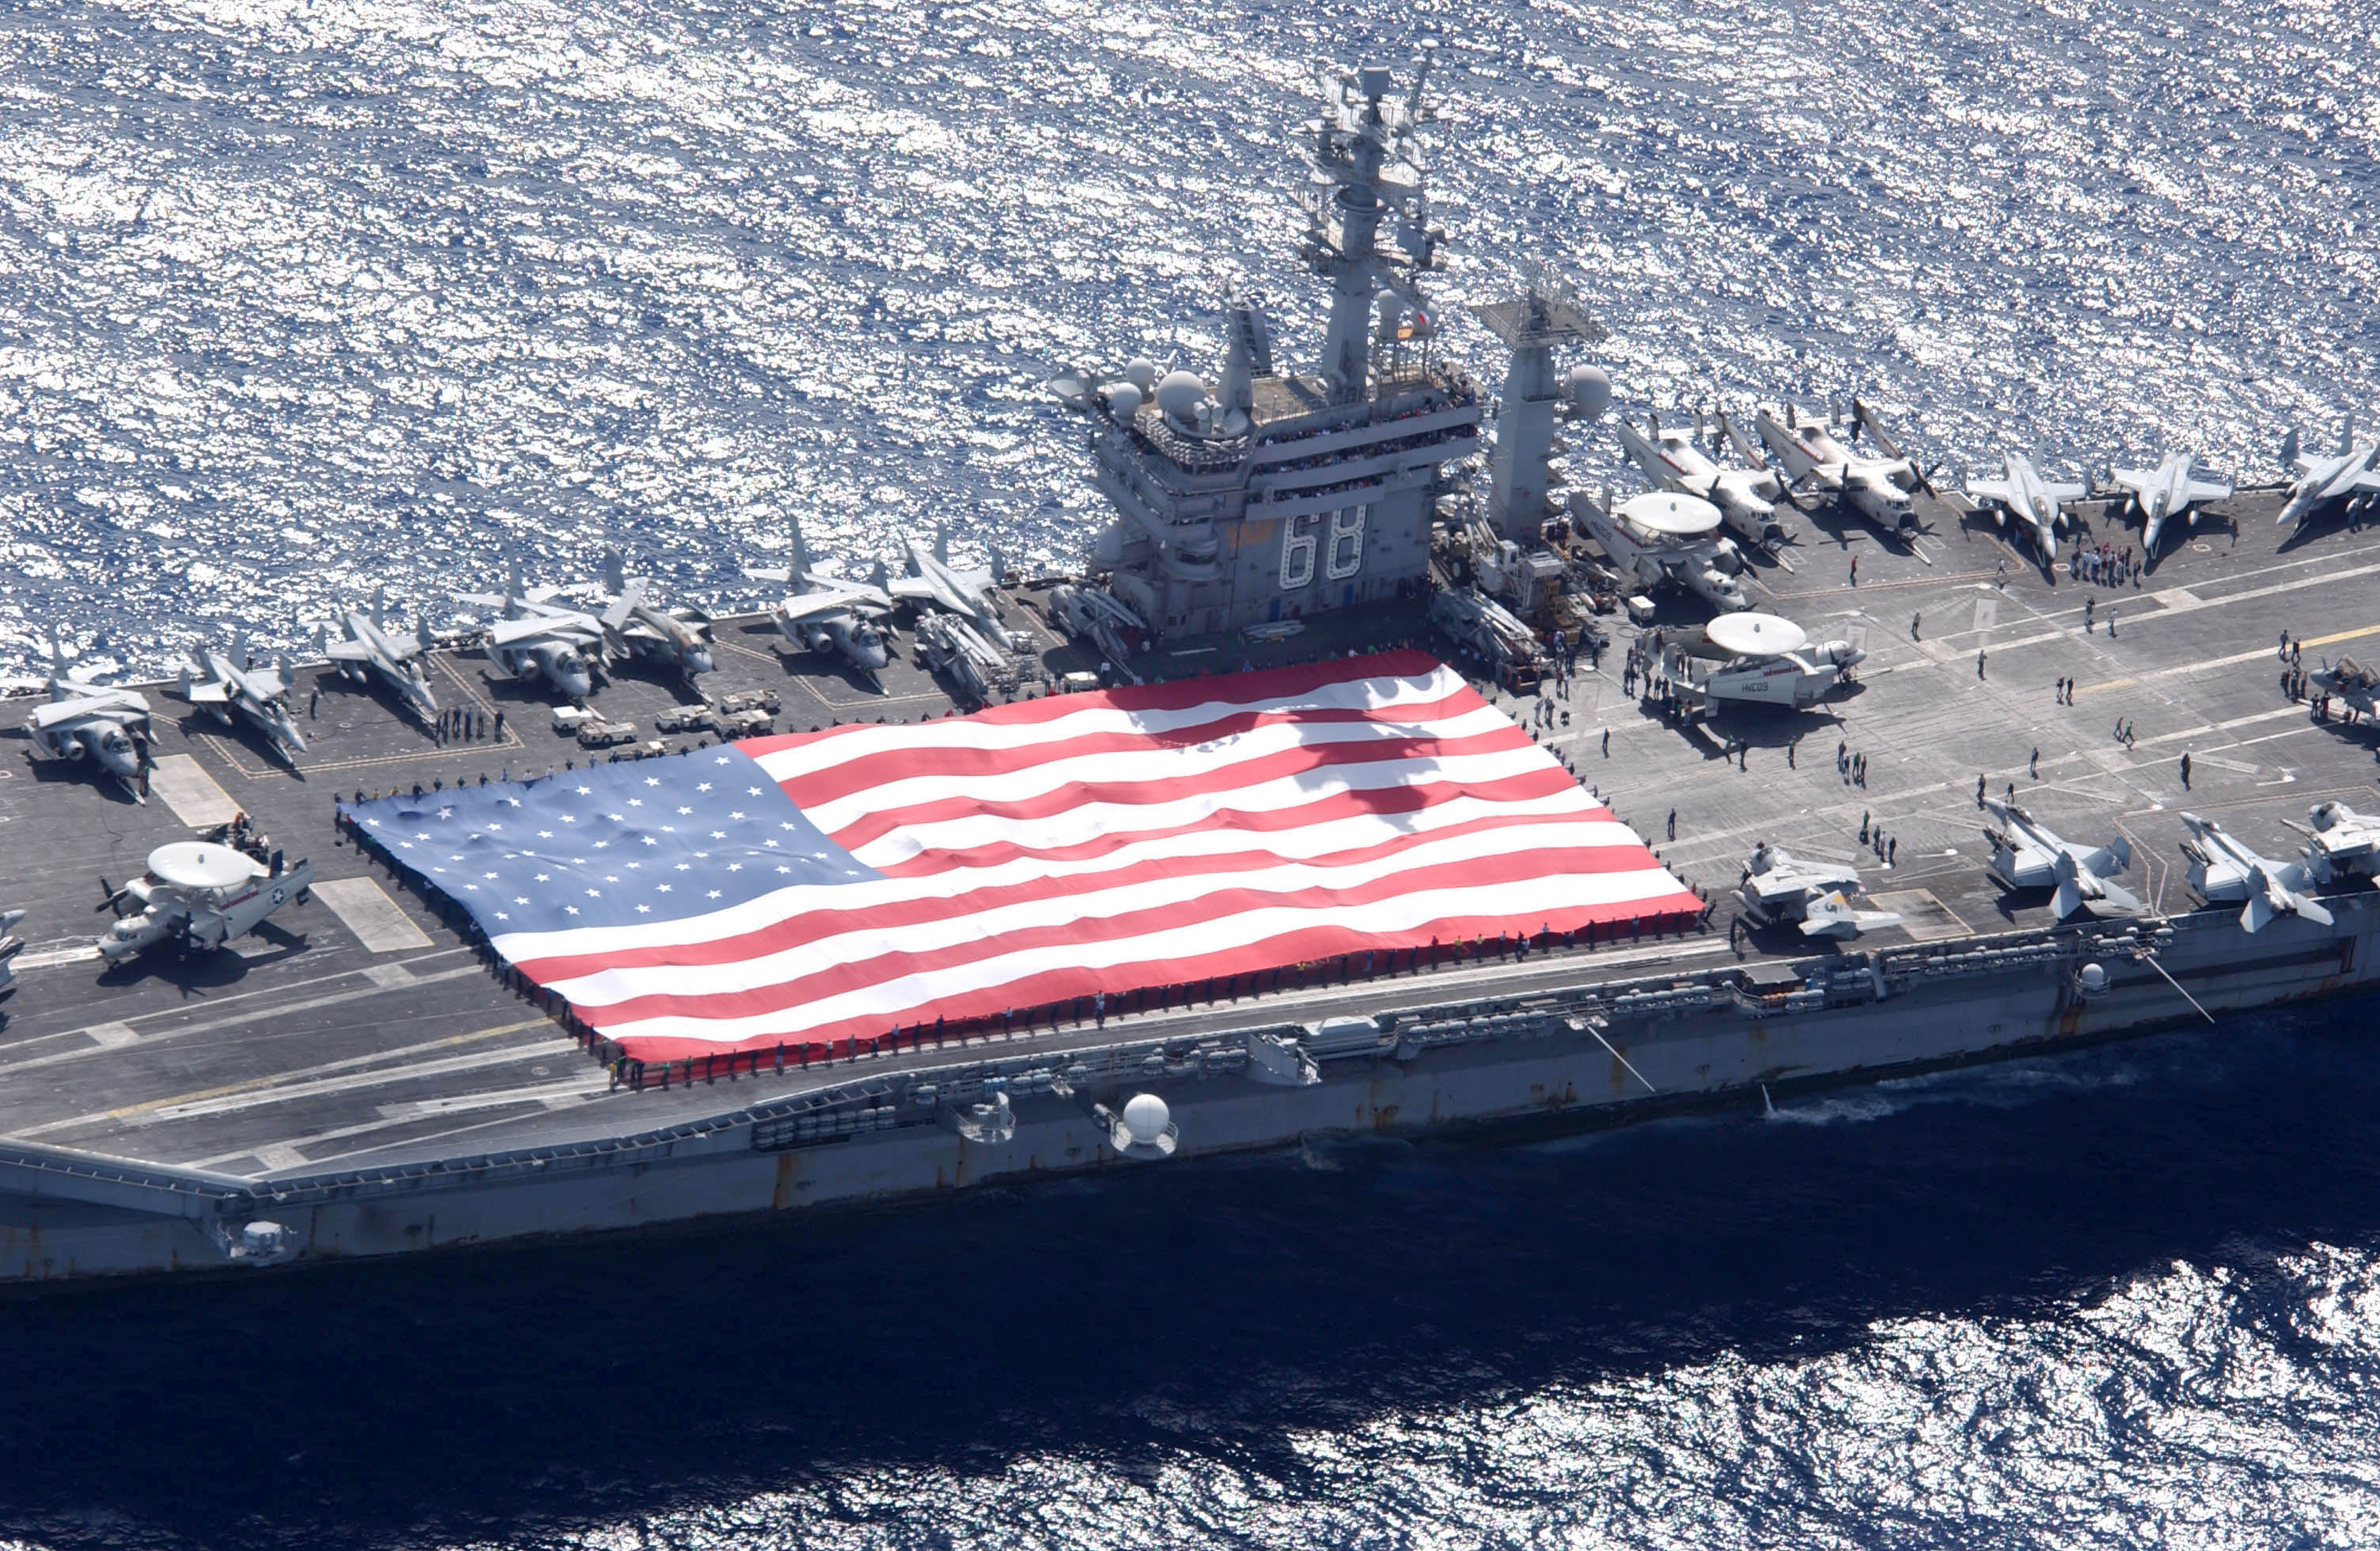 Uss Nimitz (cvn 68) And Carrier Air Wing Eleven (cvw.